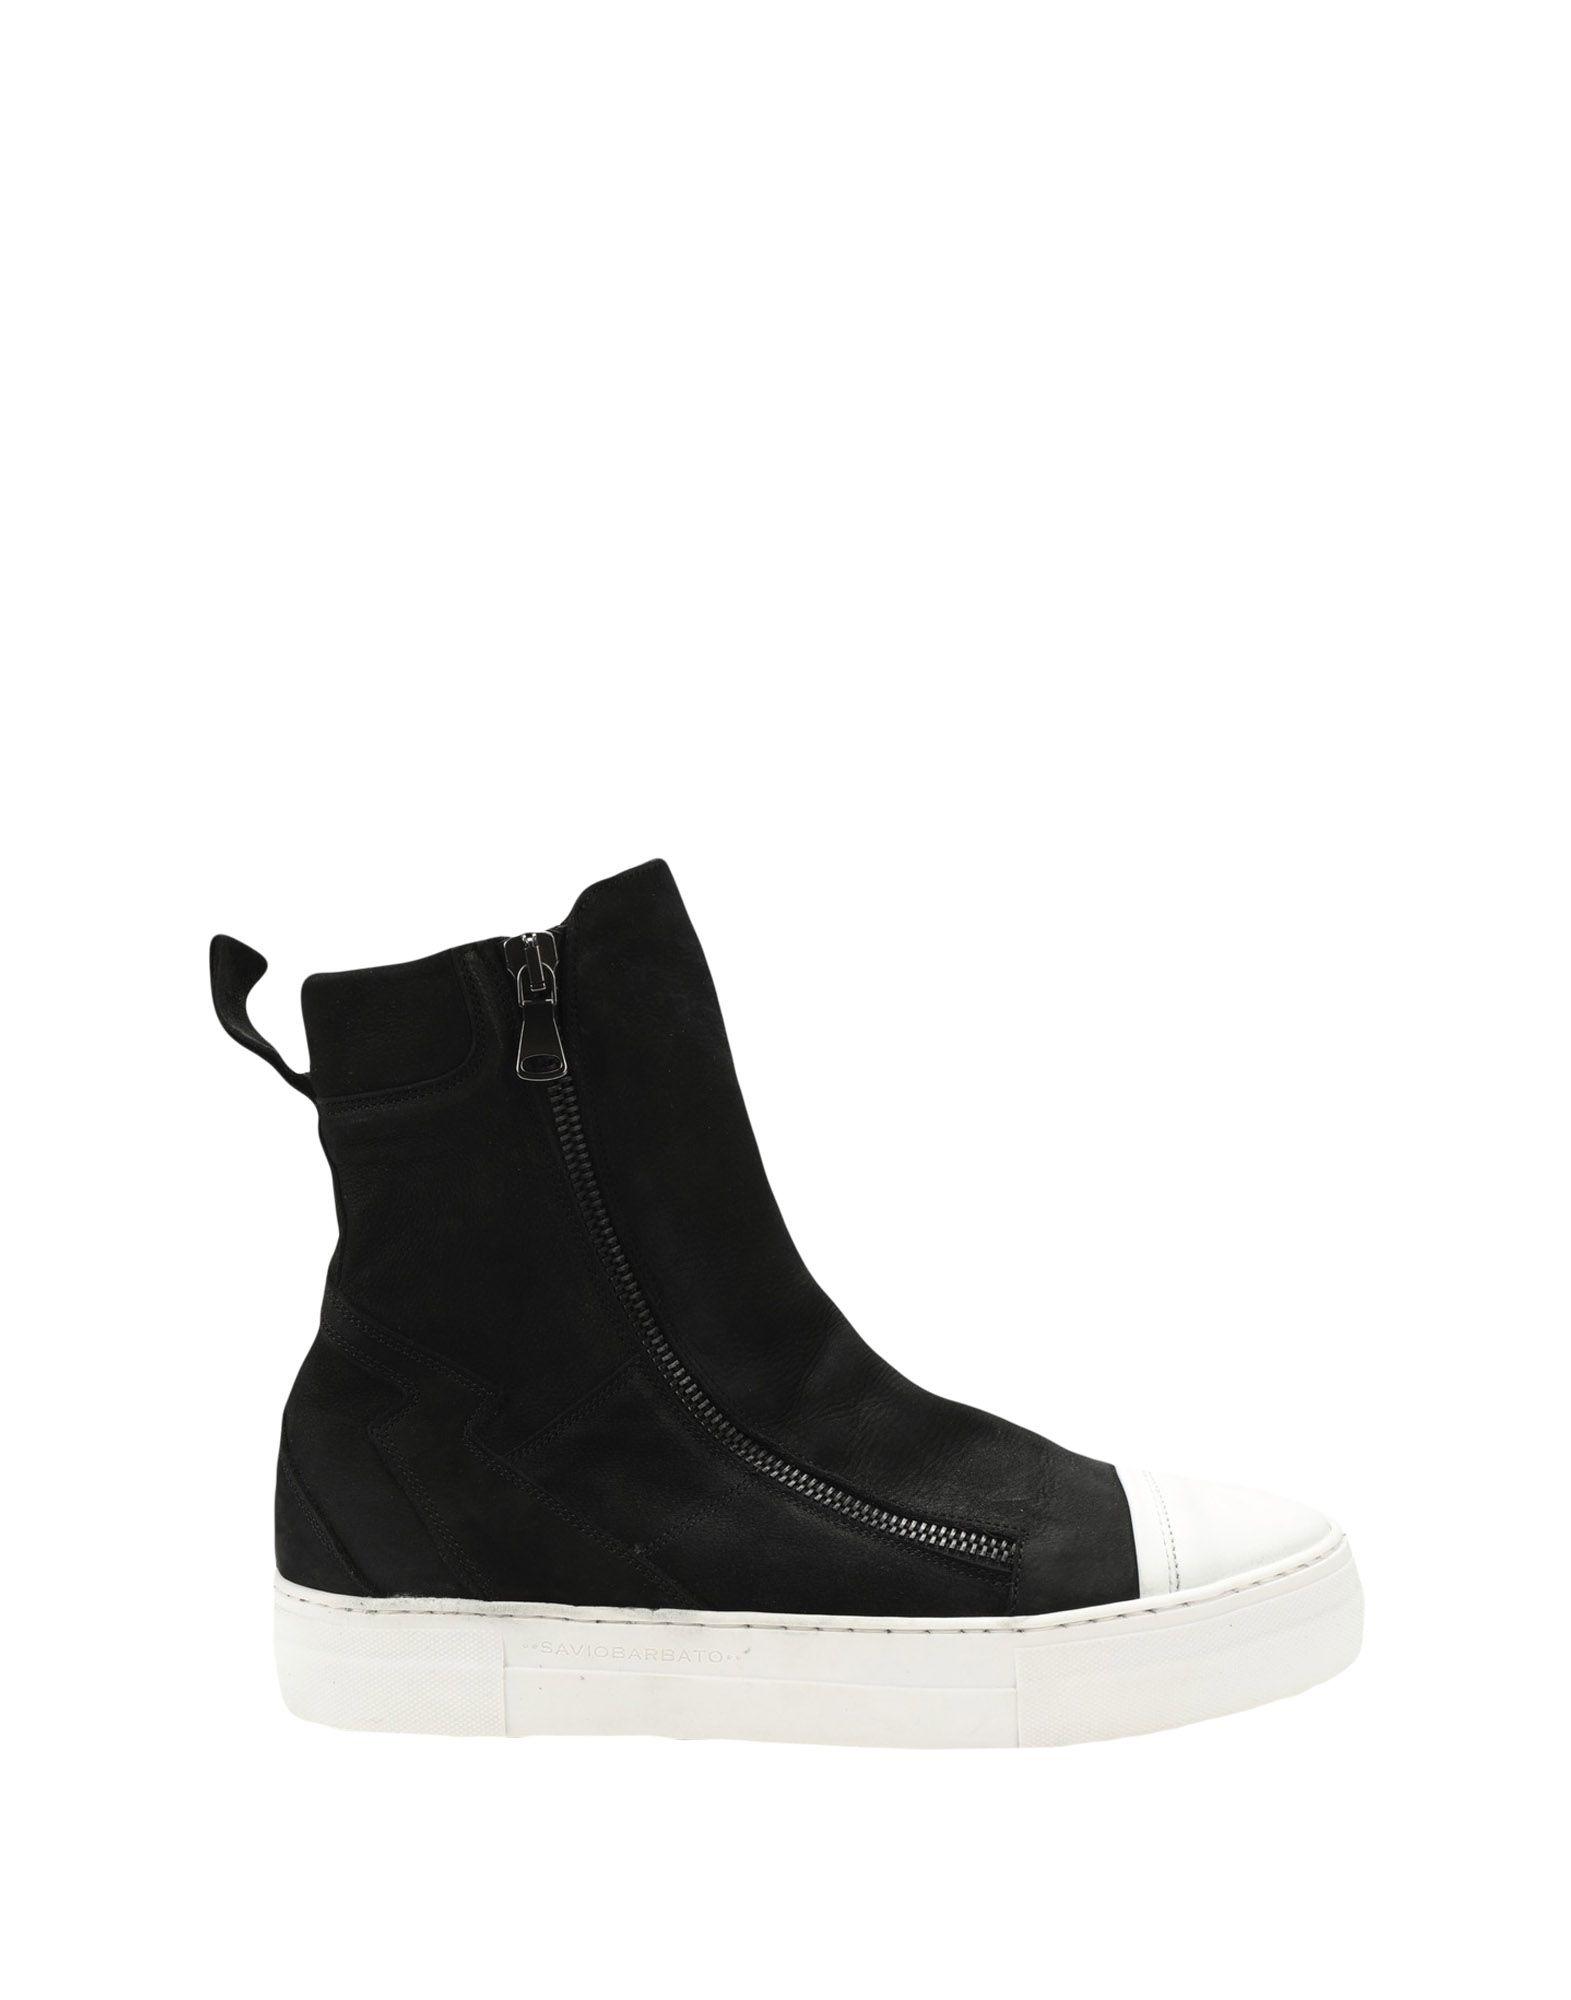 Savio Barbato Sneakers Herren  11540110HF Gute Qualität beliebte Schuhe